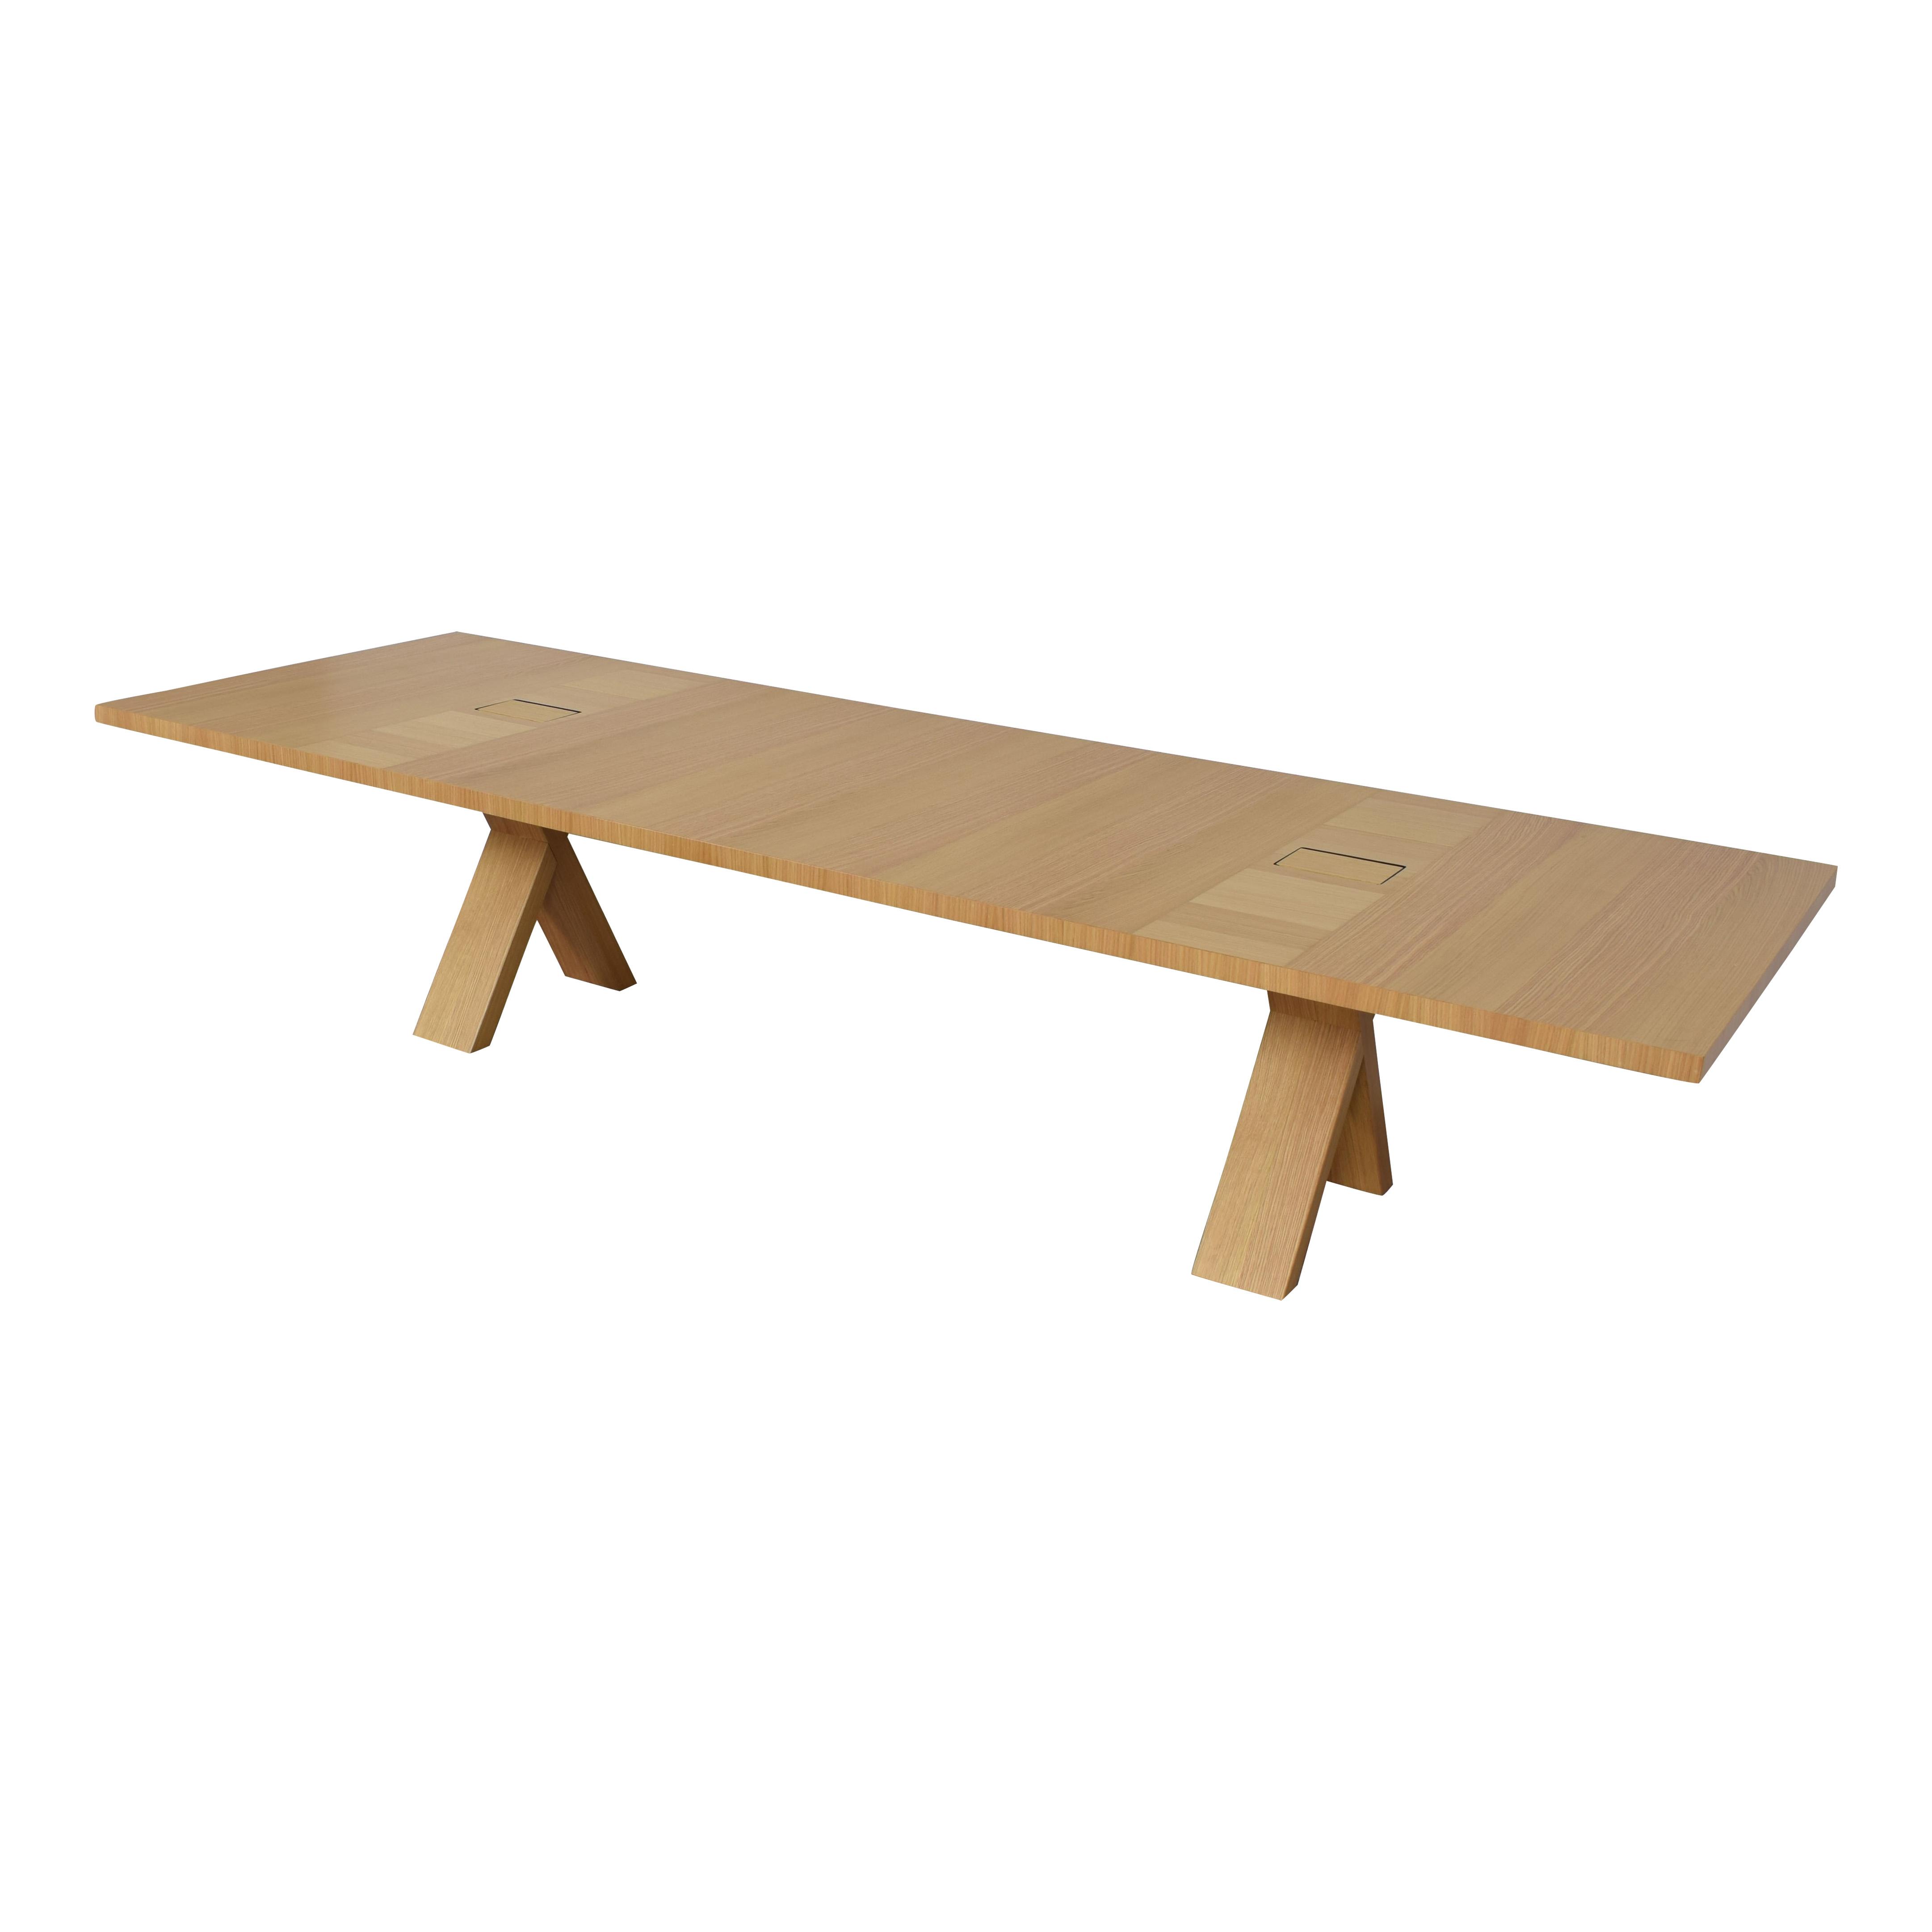 Koleksiyon Partita Dining Table / Tables